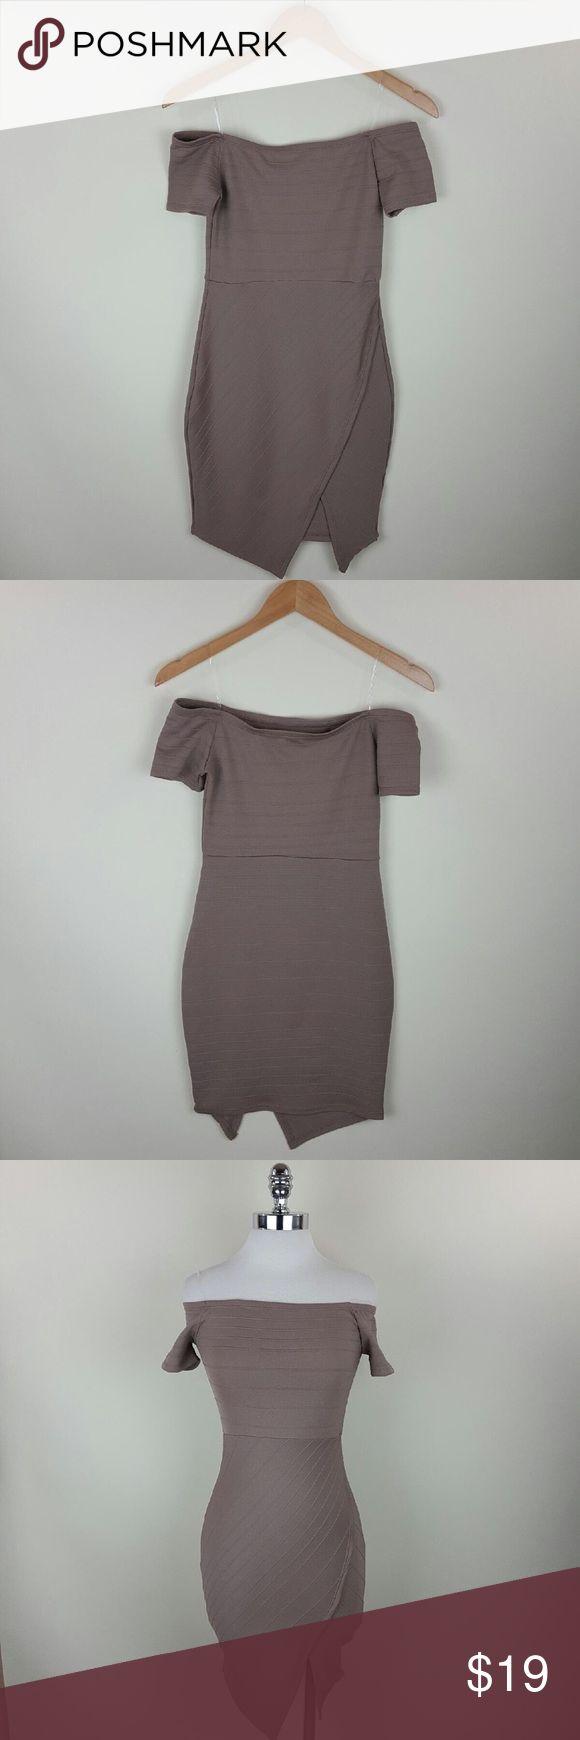 Mauve pink bandage dress Mauve pink off shoulder bandage dressContent 65% rayon 30% nylon 5% spandex Dresses Midi